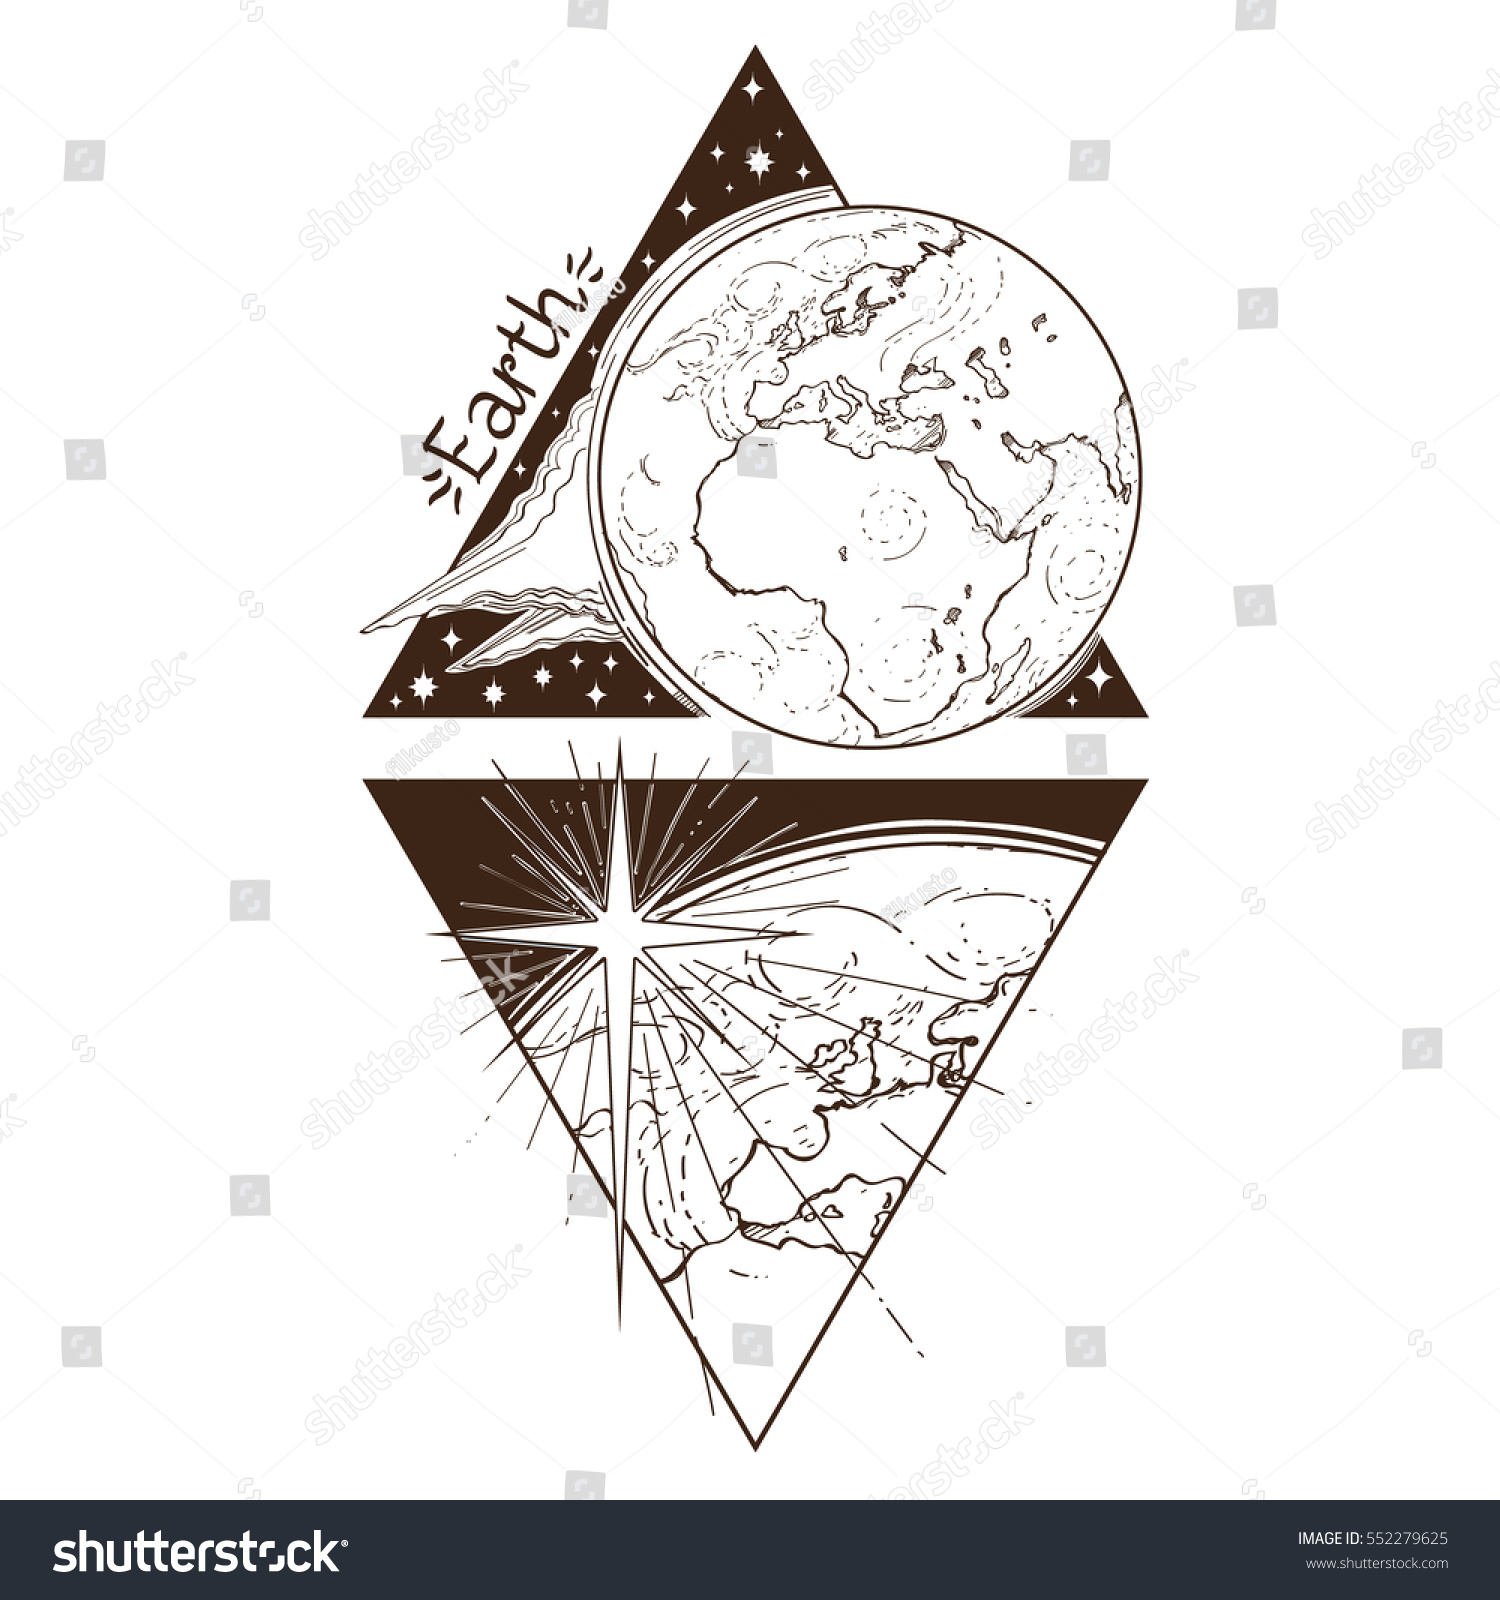 Earth Planets Stars Solar System Symbols Stock Vector